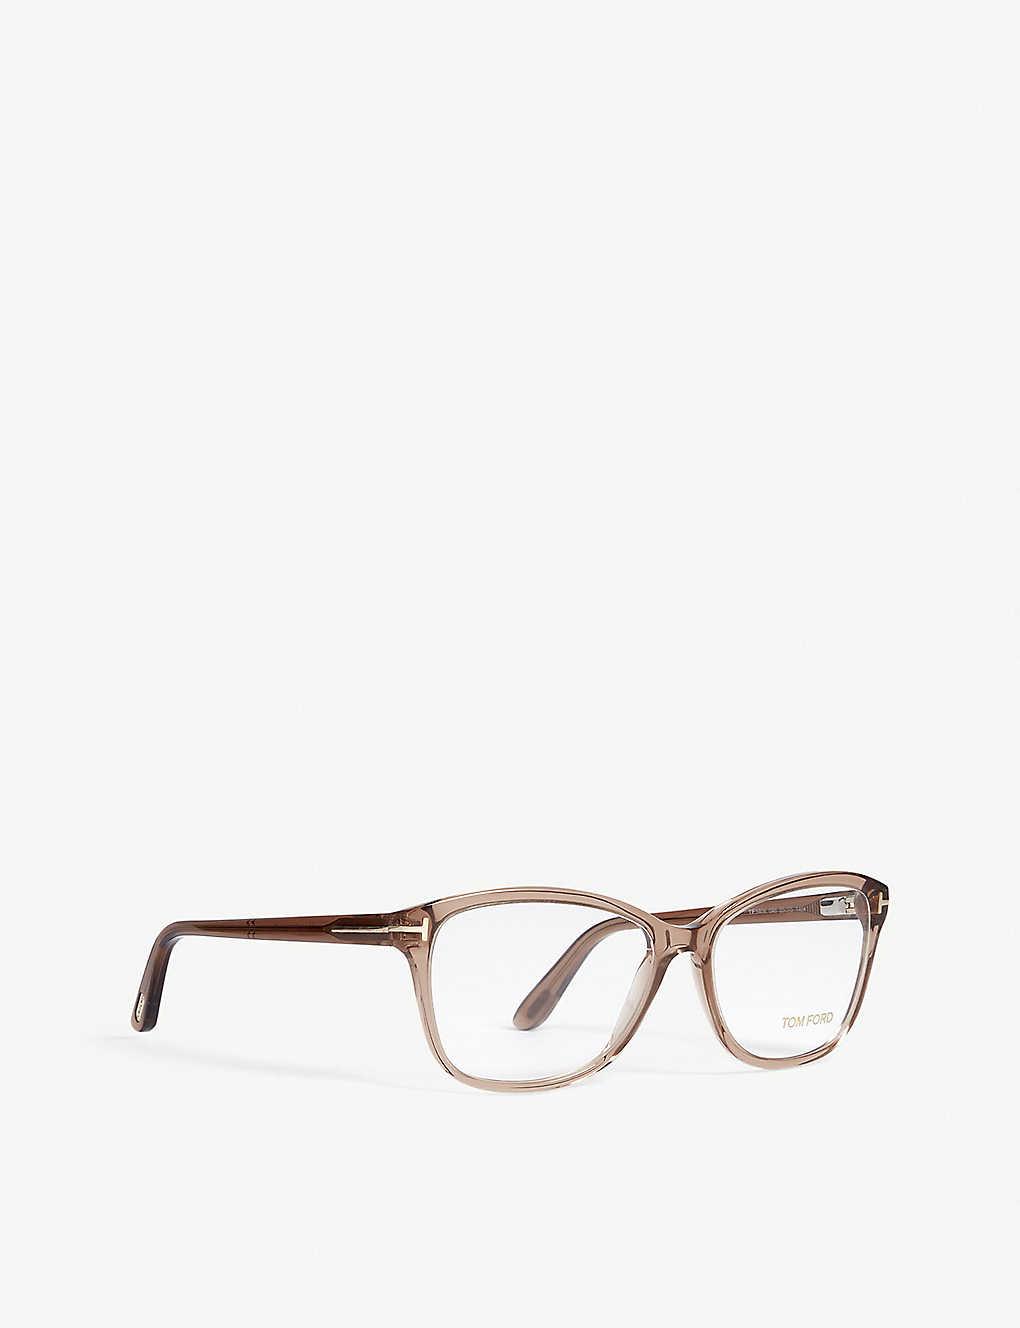 58cfb36da3ed3 ... Tf5404 rectangle-frame optical glasses - Brown ...